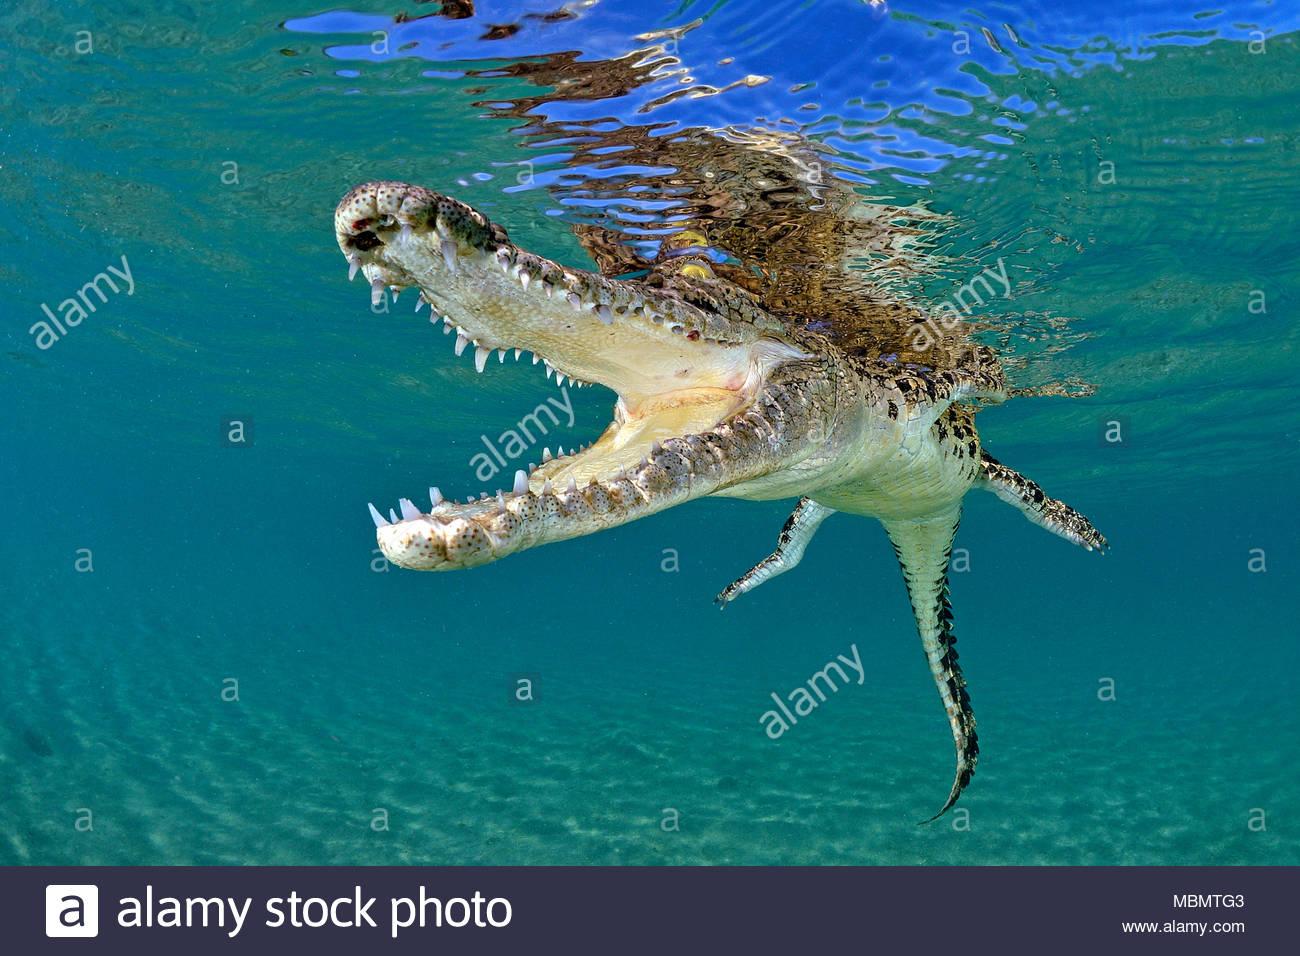 Saltwater crocodile (Crocodylus porosus), largest of all living reptiles, Kimbe Bay, West New Britain, Papua New Guinea - Stock Image